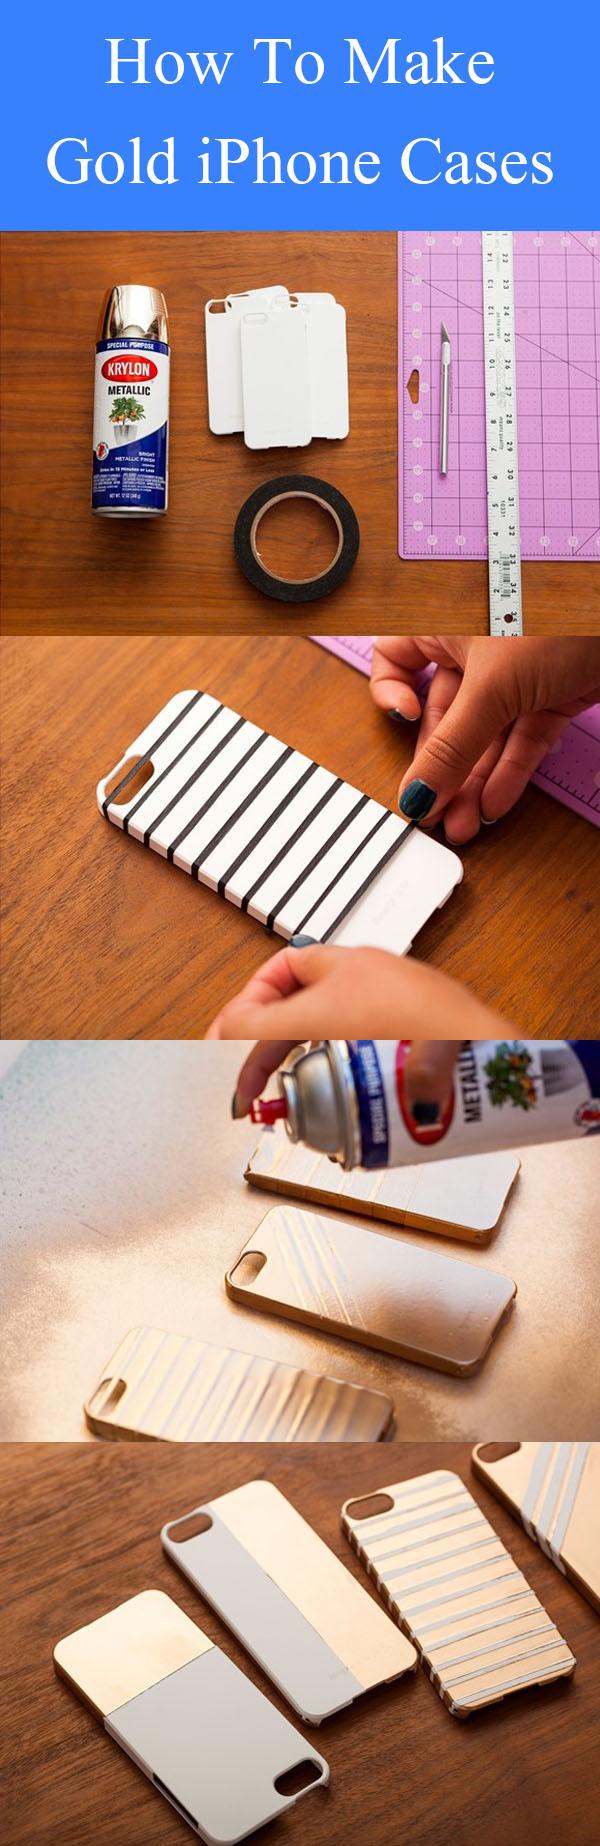 DIY Gold iPhone Cases